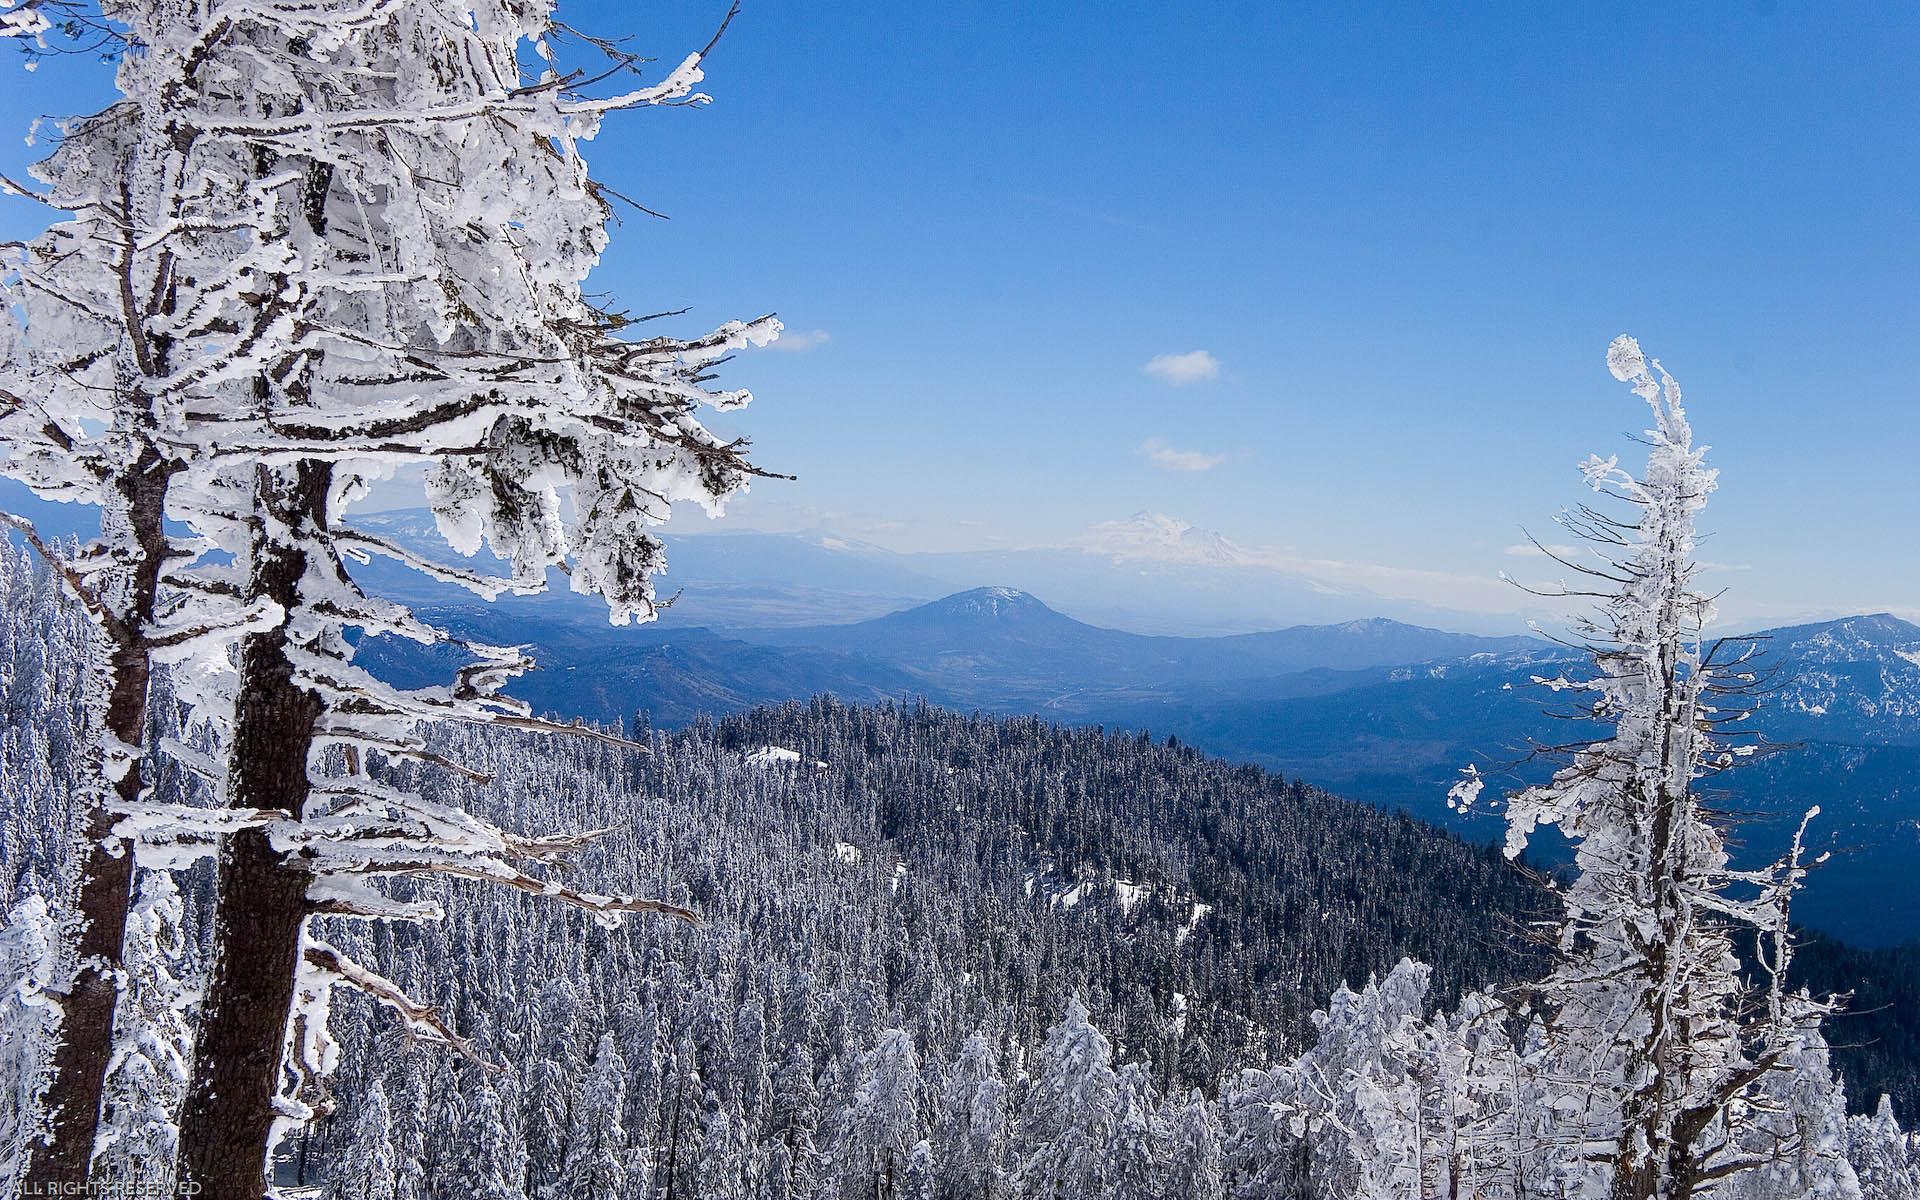 Картинка следующая картинка зимний